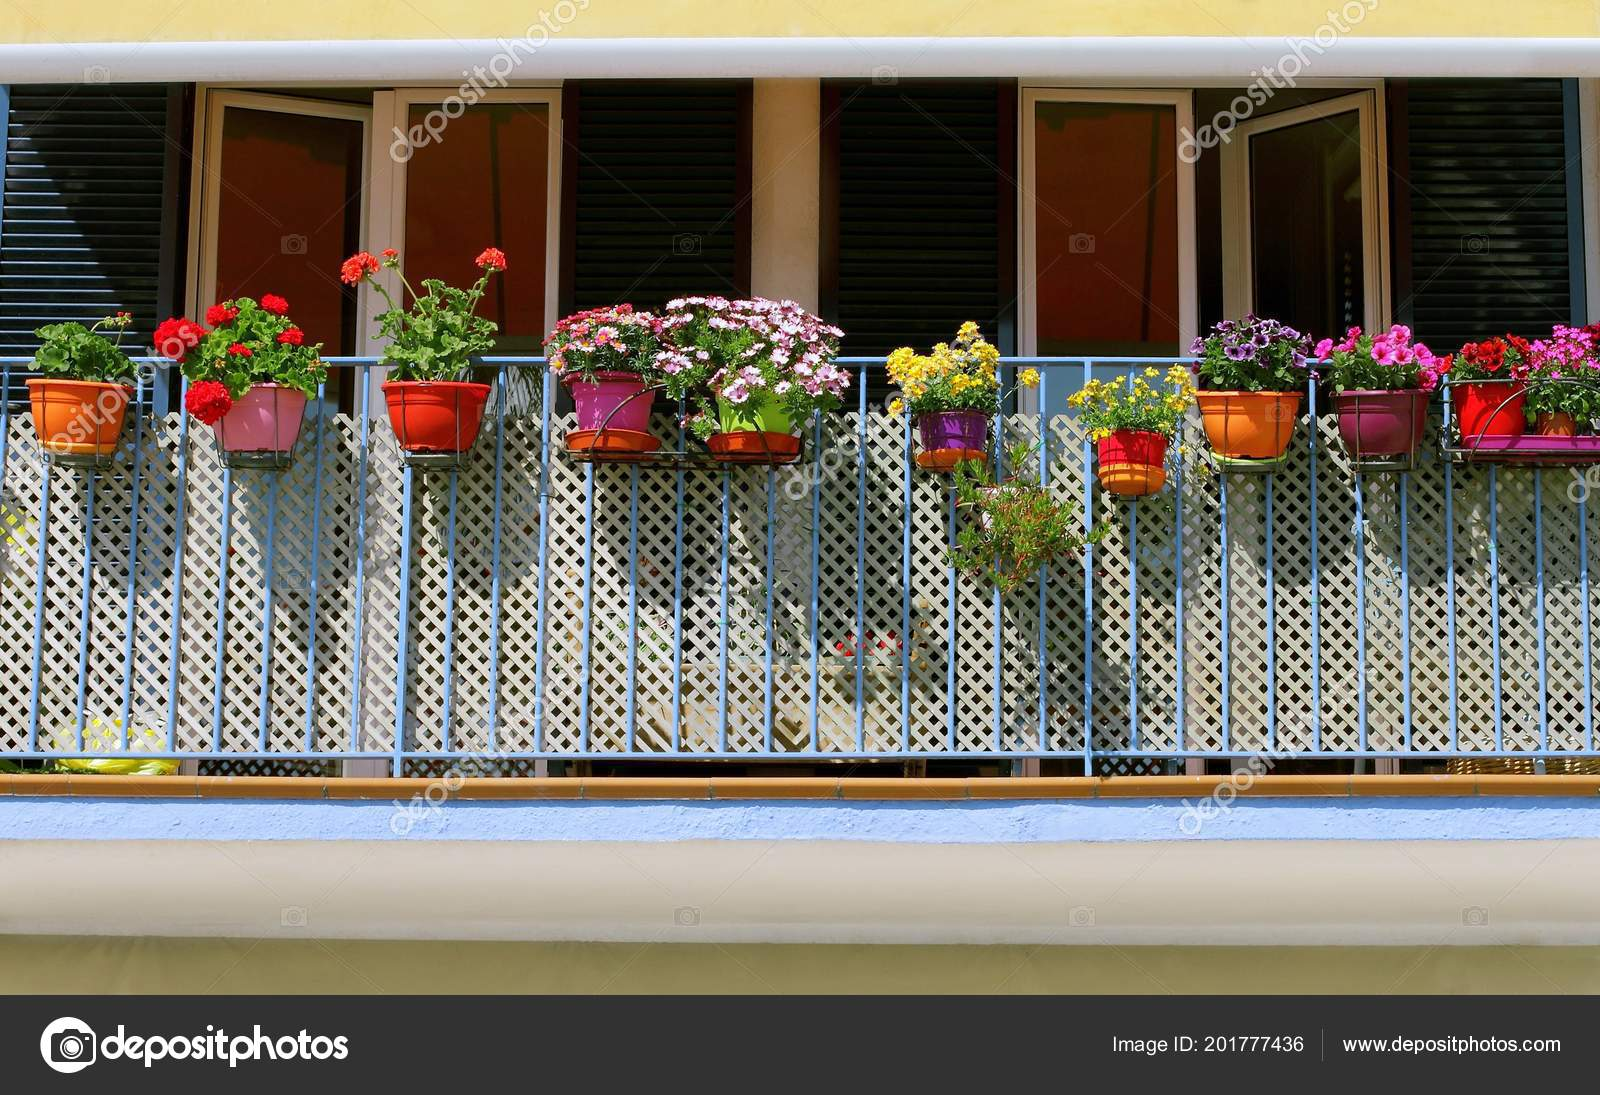 Potted Spring Flowers Sunny Balcony City Stock Photo C Boaphotostudio 201777436